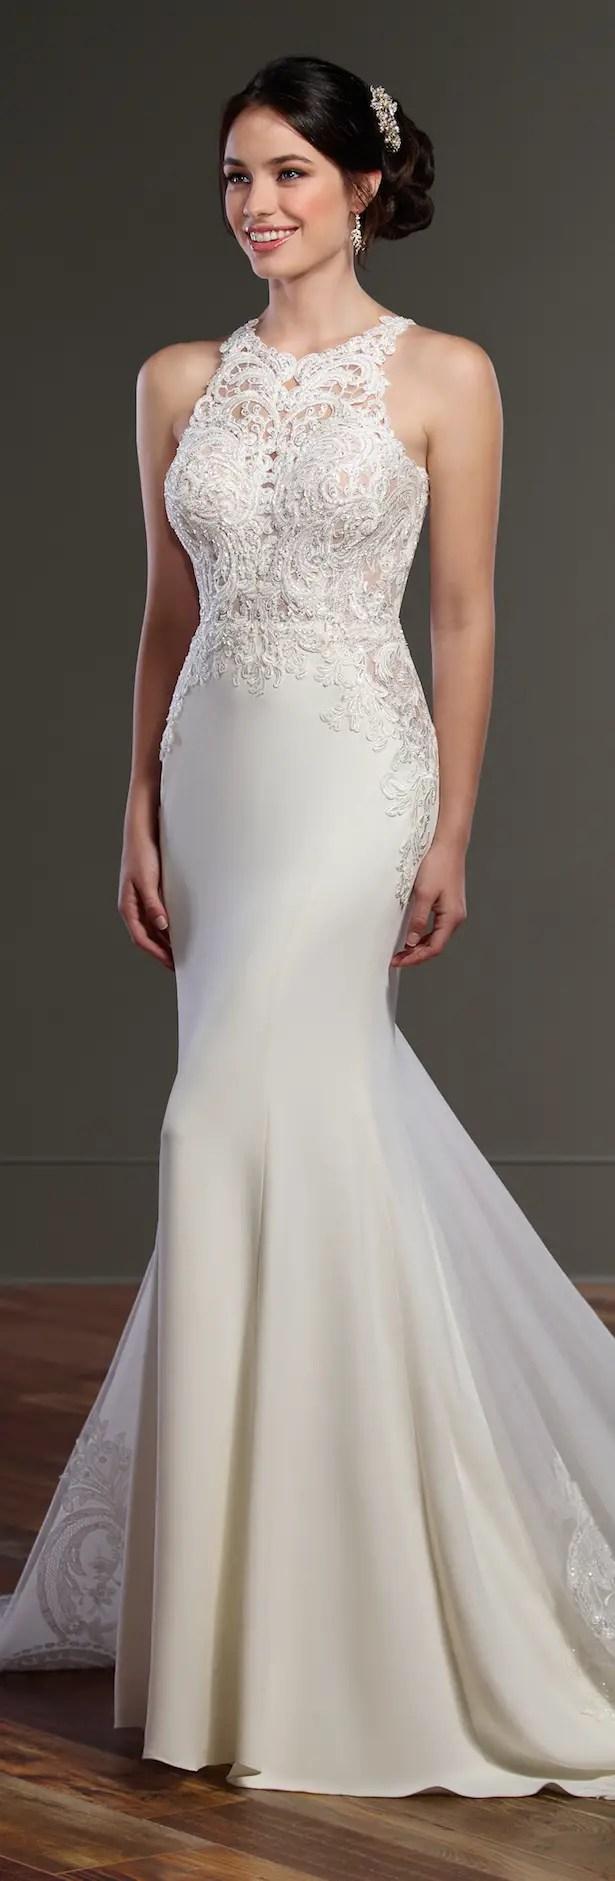 Trubridal Wedding Blog | Wedding Dresses by Martina Liana ...